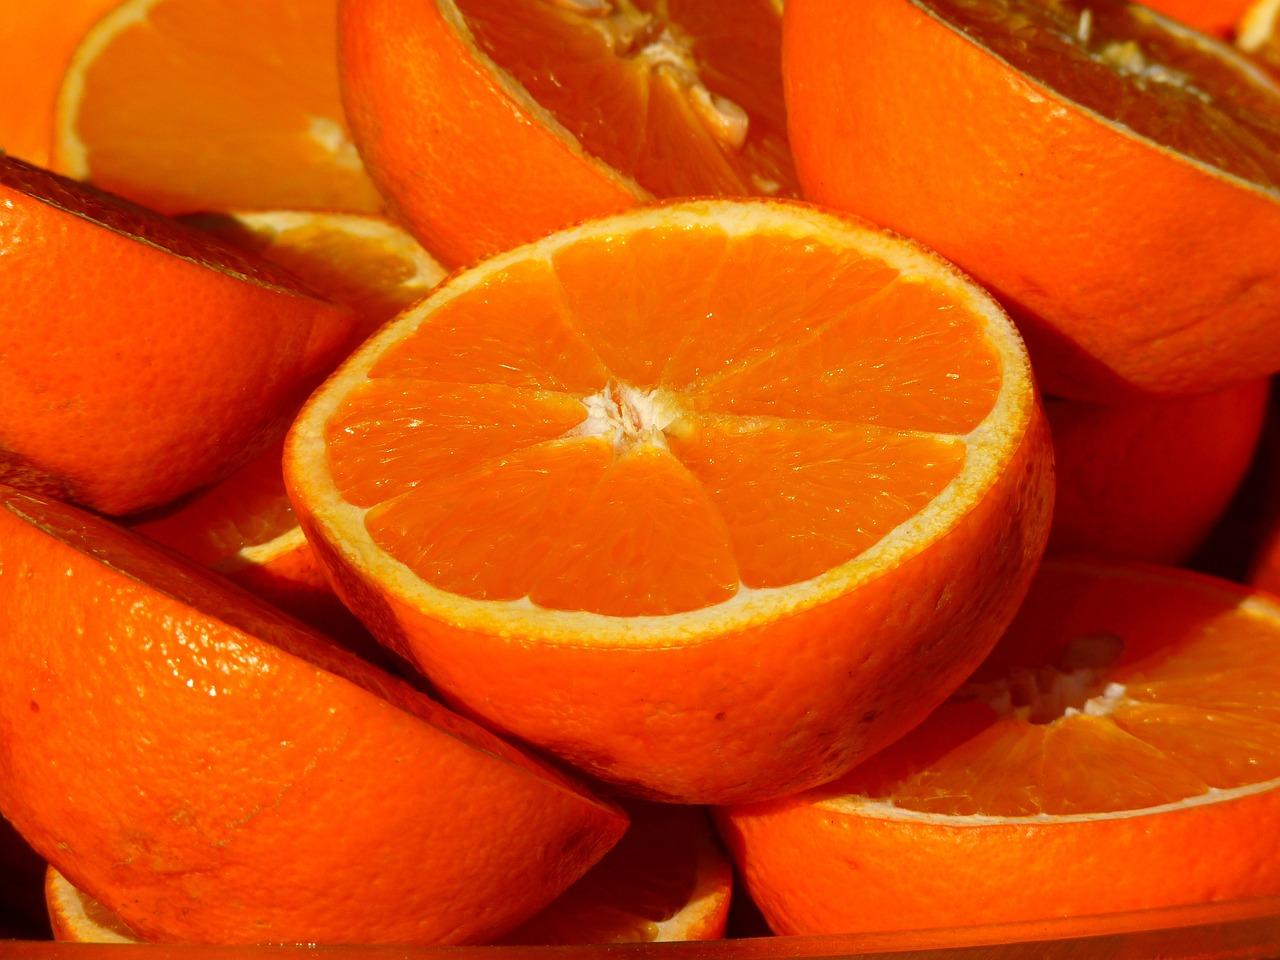 oranges-15046_1280.jpg